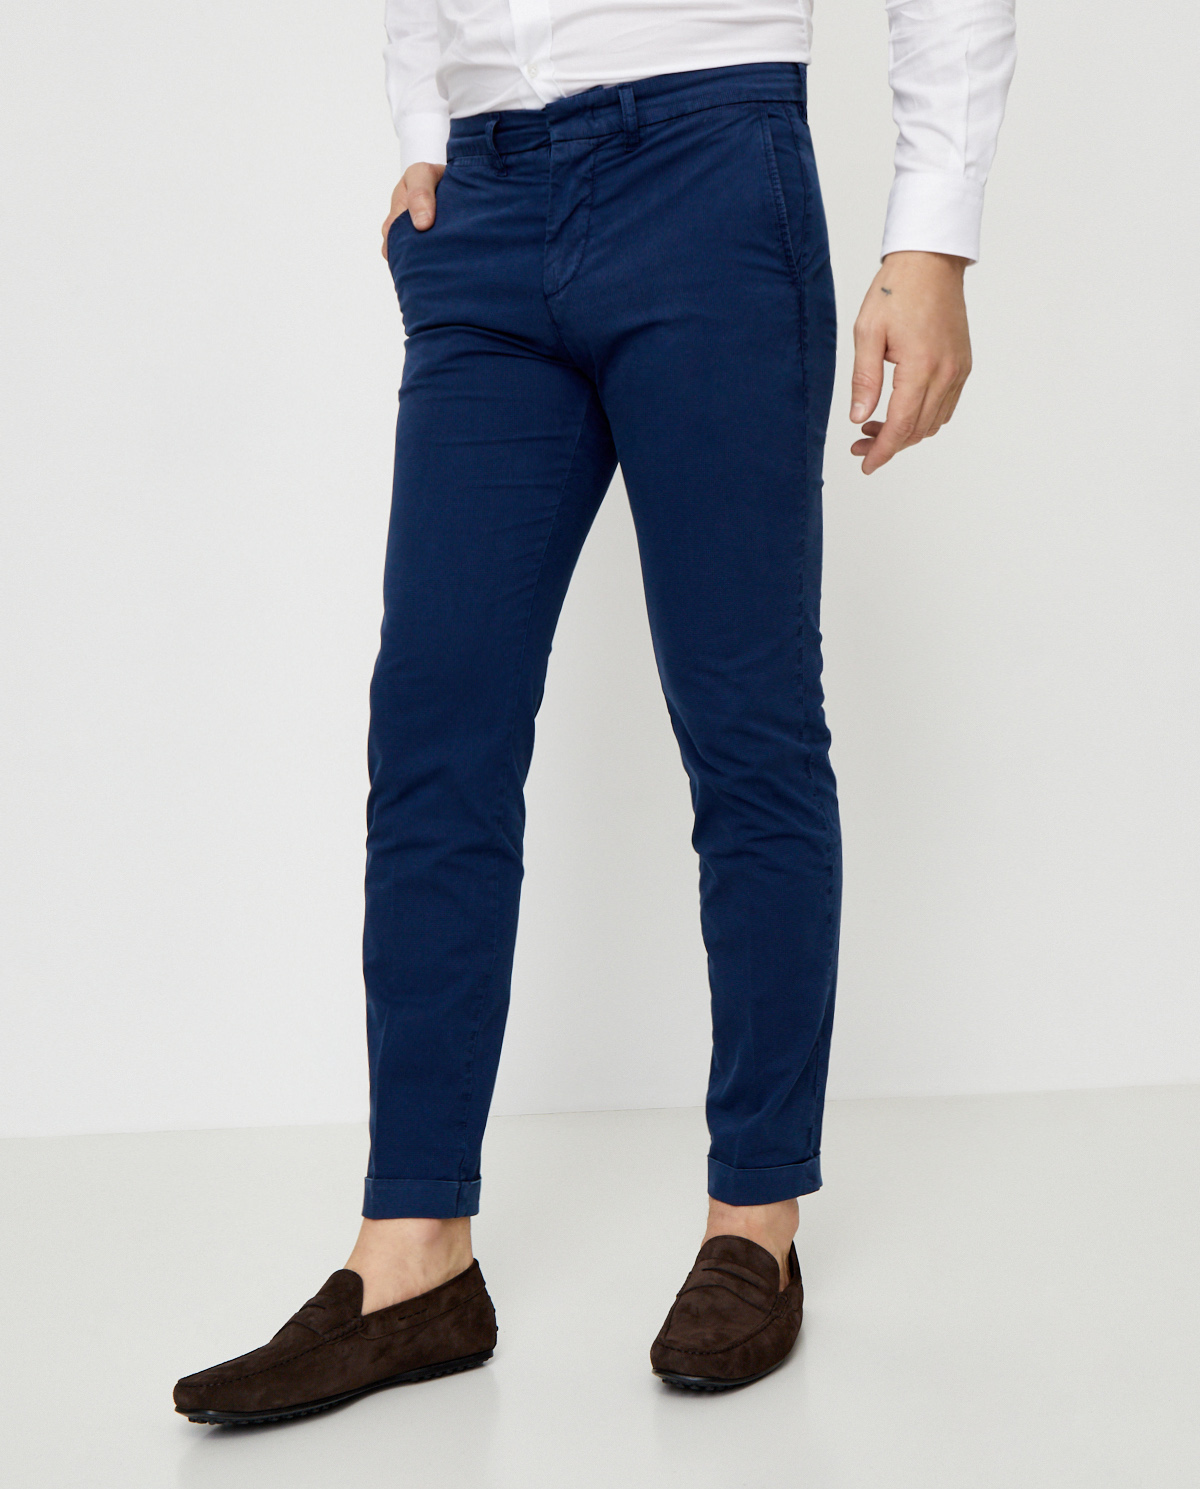 Granatowe spodnie chino Fay NTM8640189TRUJU218